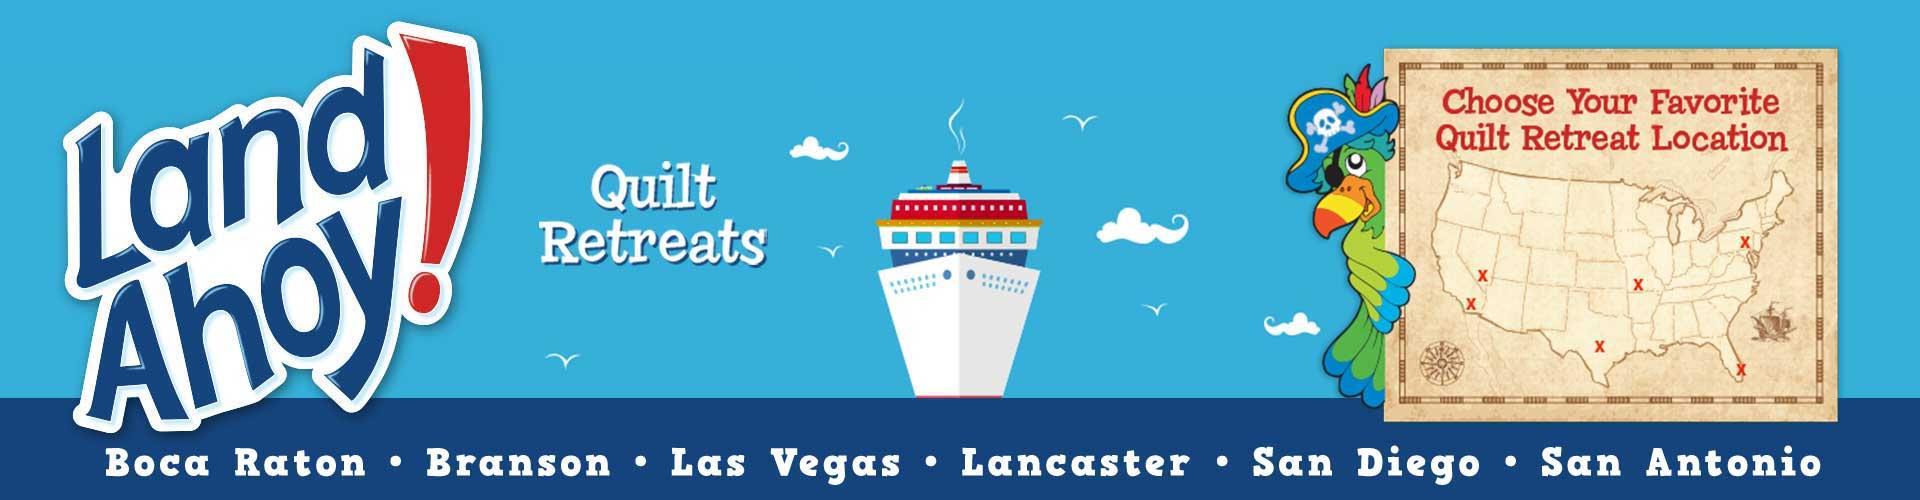 Land Ahoy 2022 Quilt Retreats in Boca Raton, Branson, Las Vegas, Lancaster, San Diego, and San Antonio